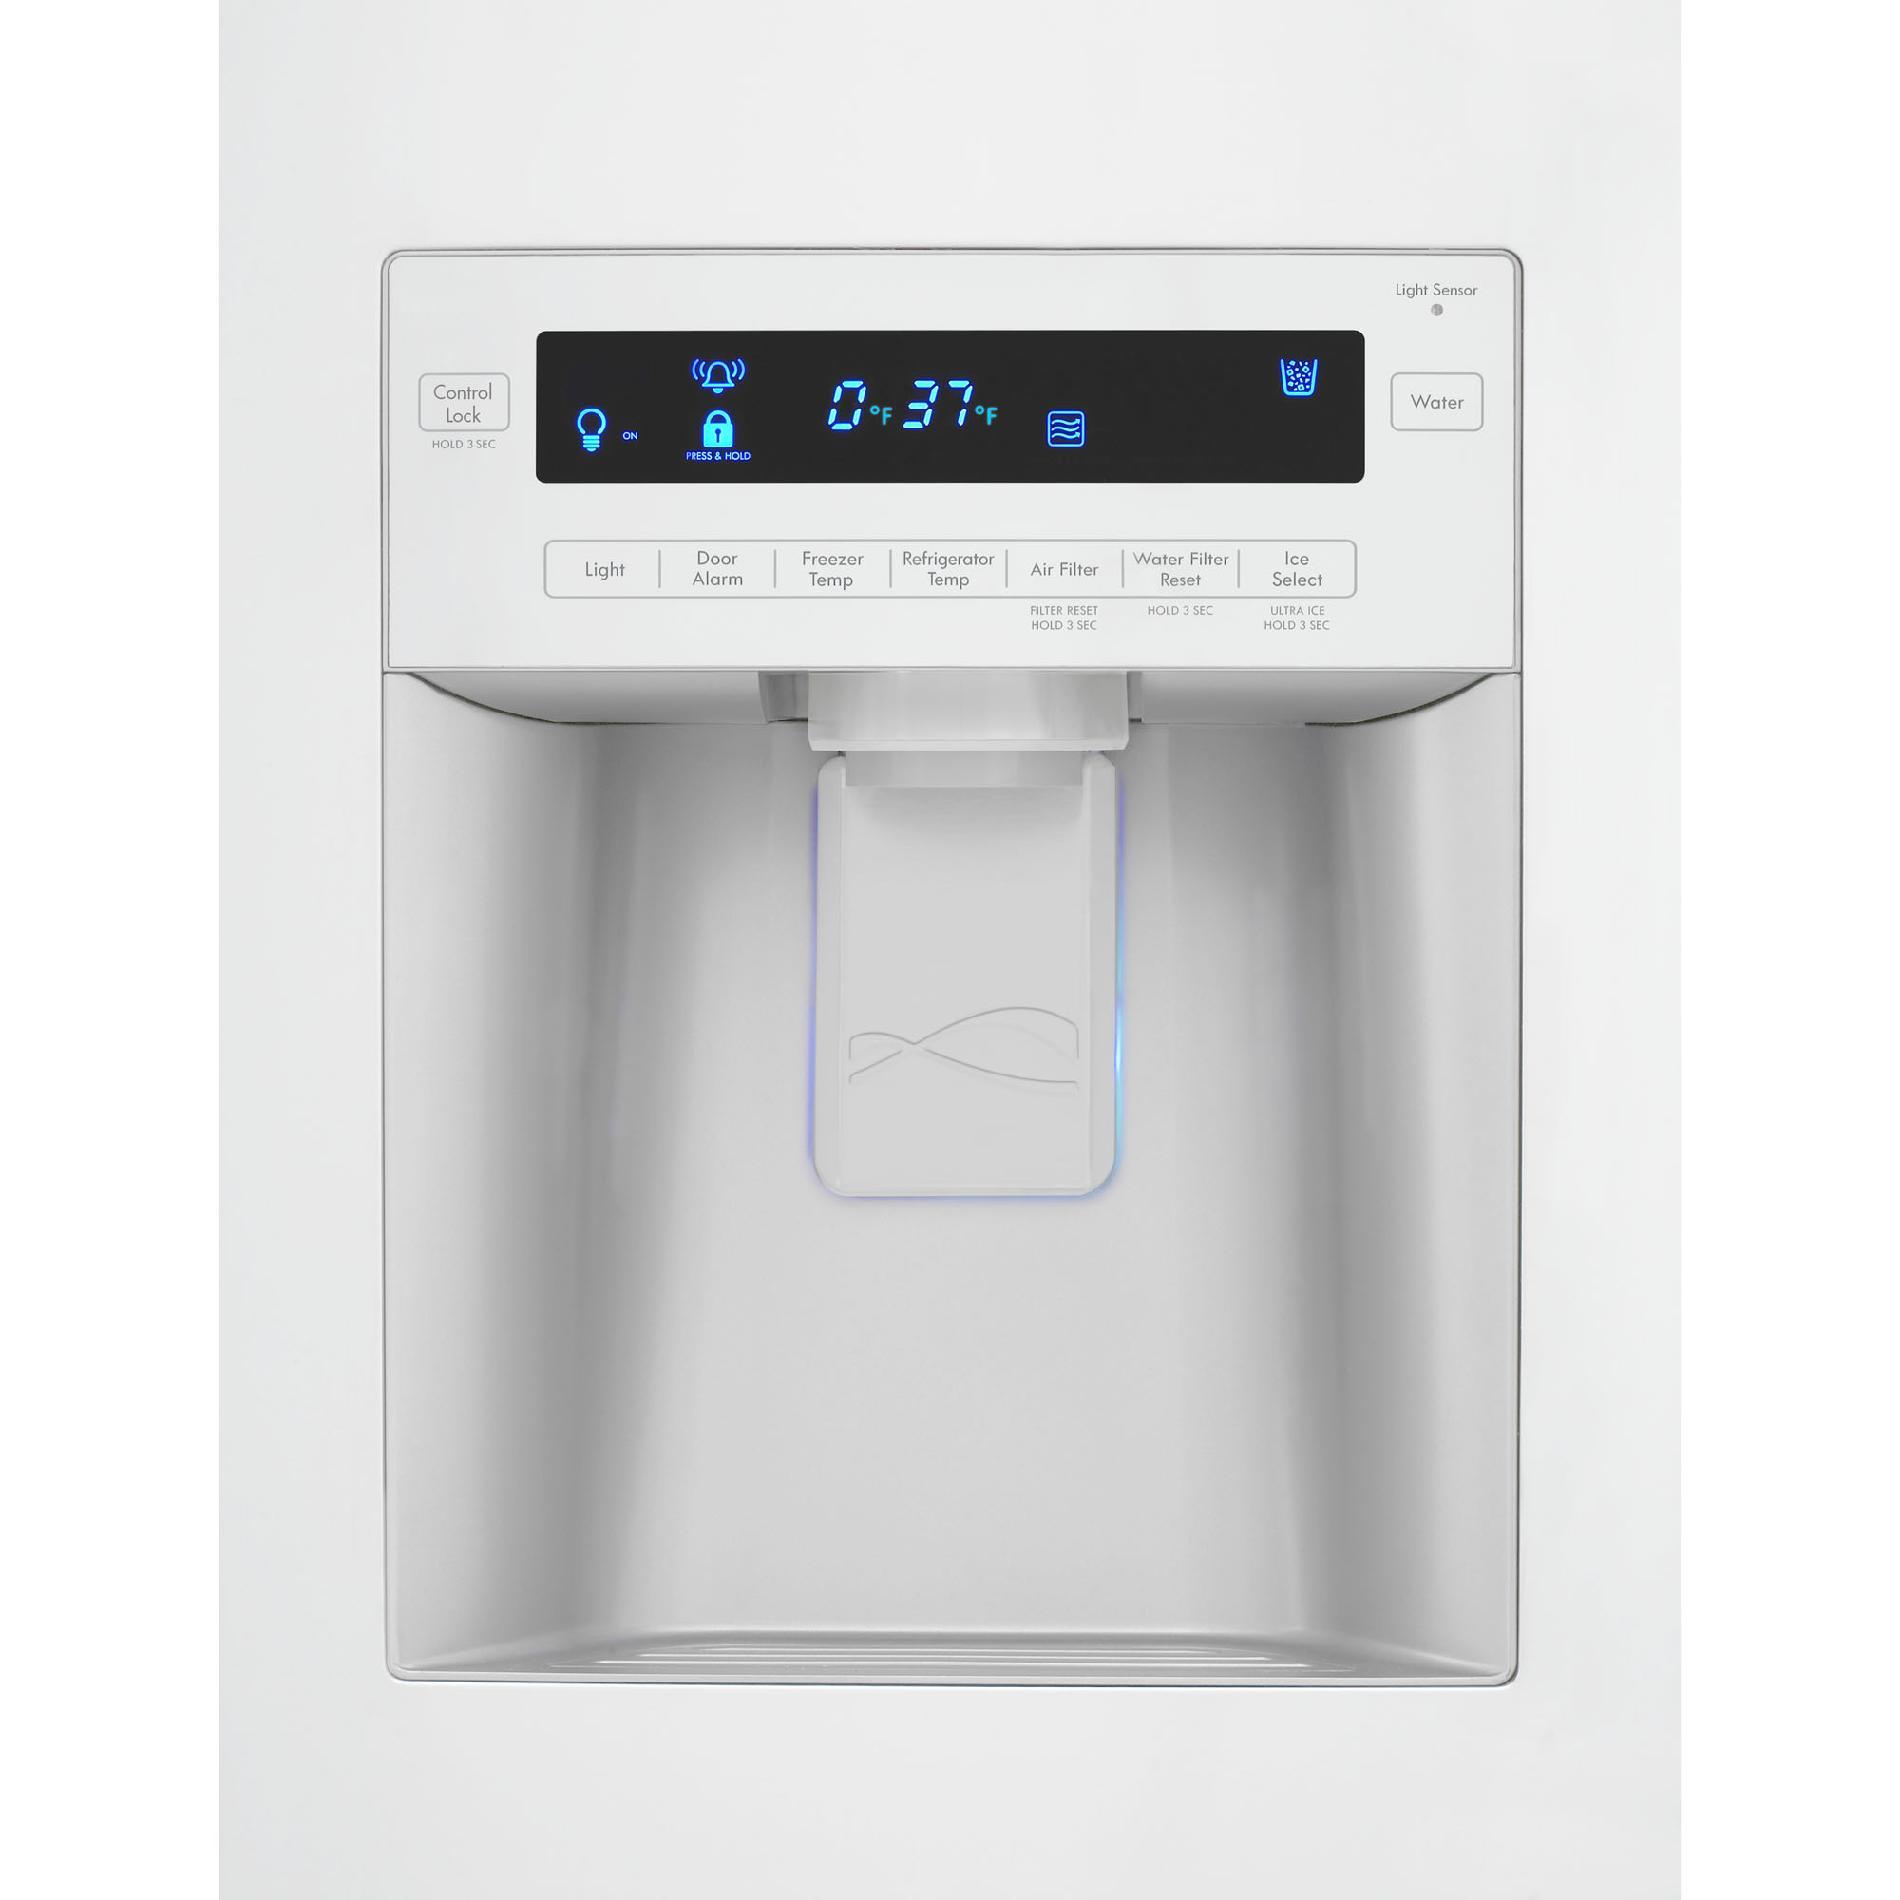 Kenmore Elite 29 cu. ft. Grab-N-Go French Door Bottom-Freezer Refrigerator - White